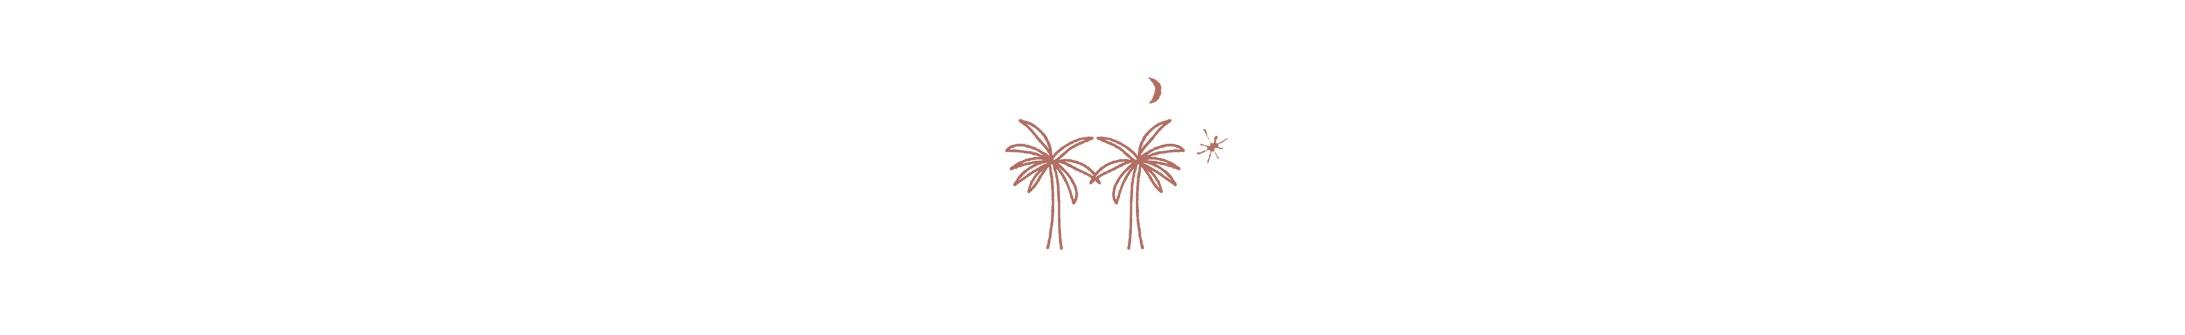 palmeras+marron.jpg